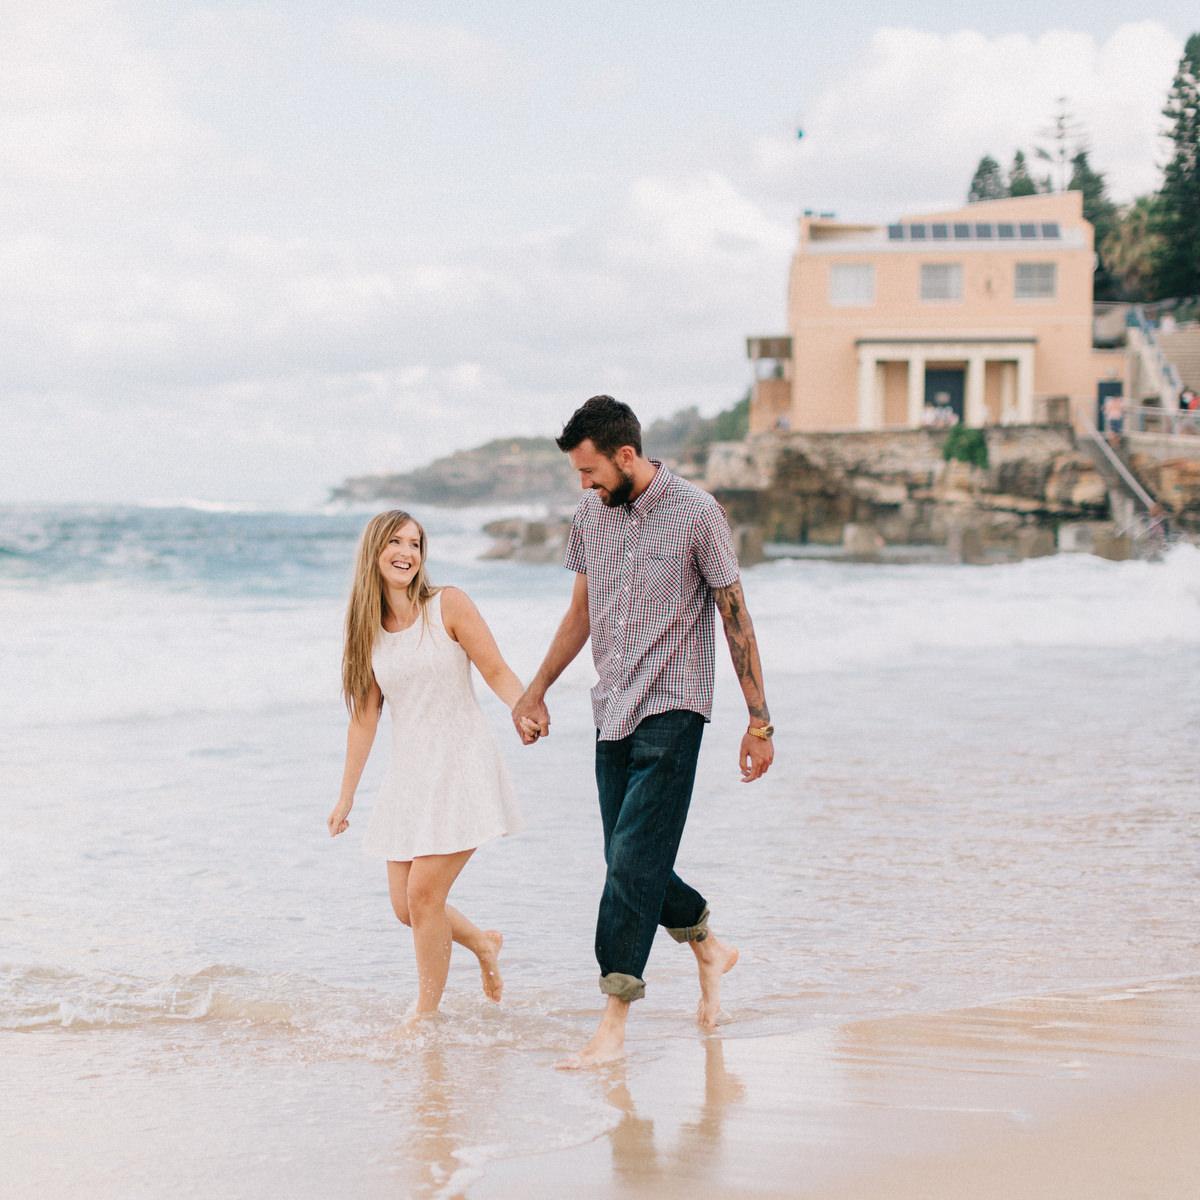 Stephanie + William : Coogee Beach Engagement Shoot | Sydney